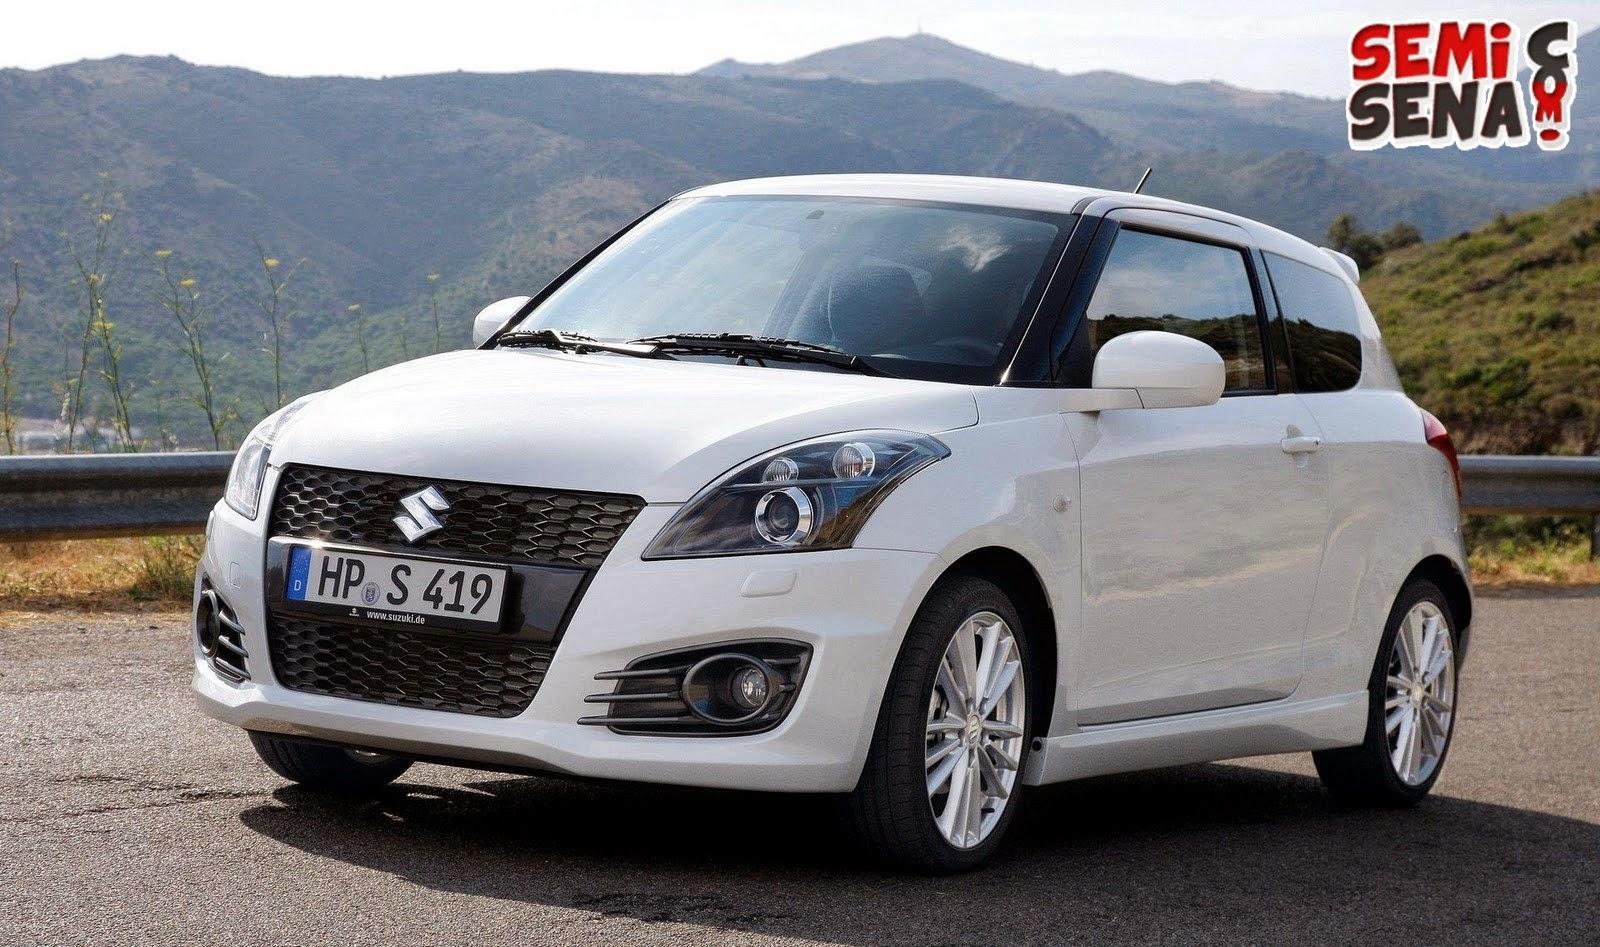 Suzuki swift 2015 price